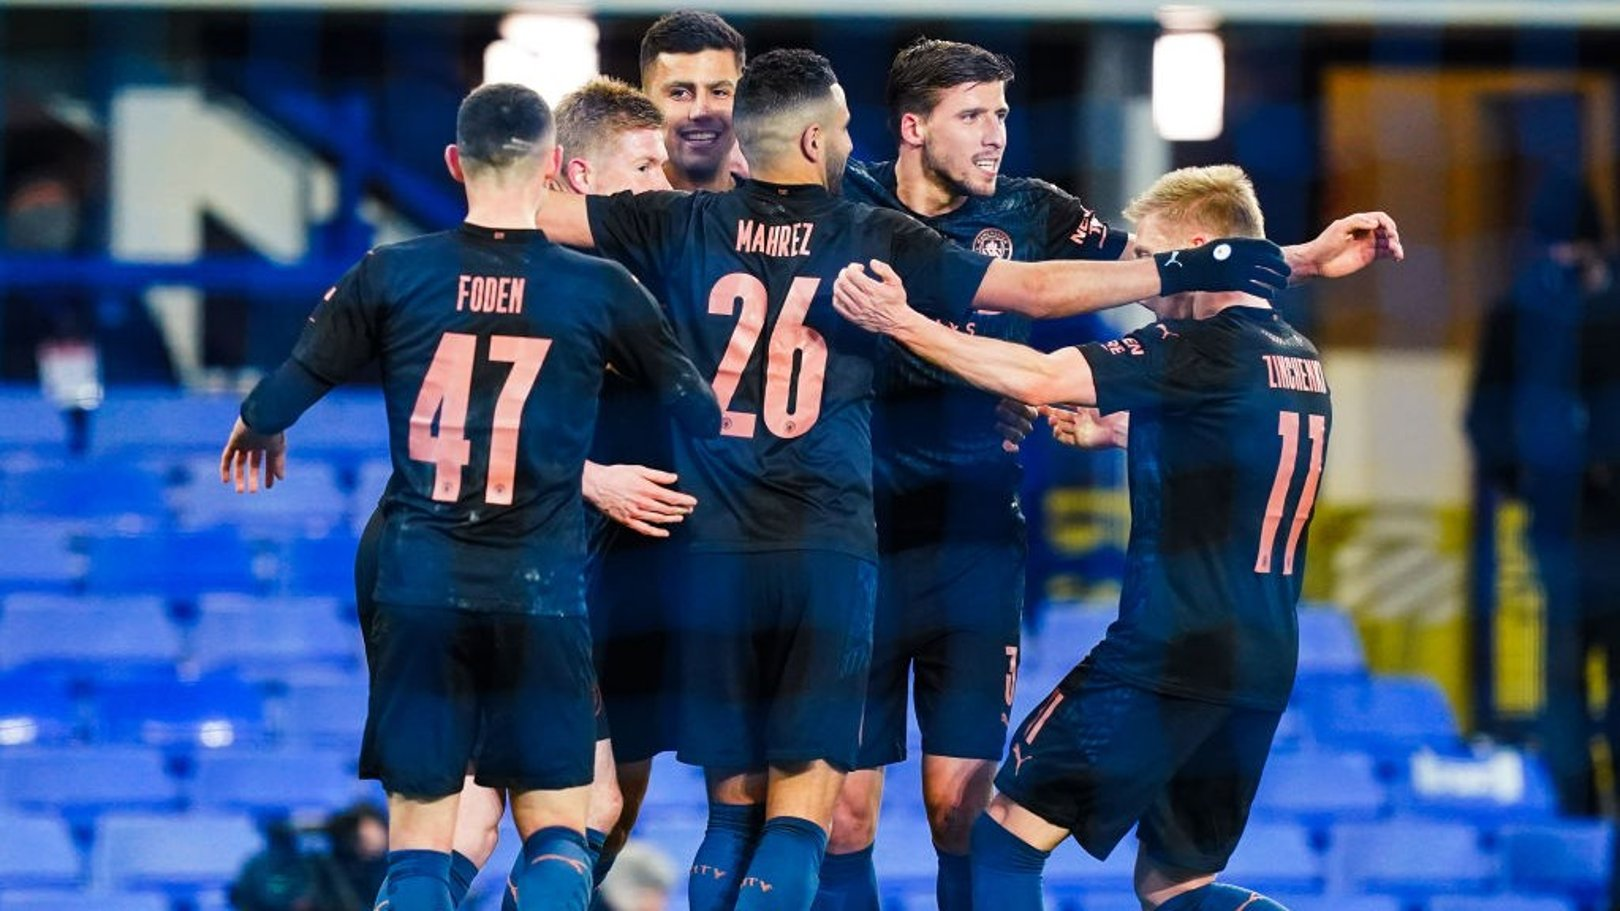 FA Cup semi-final draw confirmed